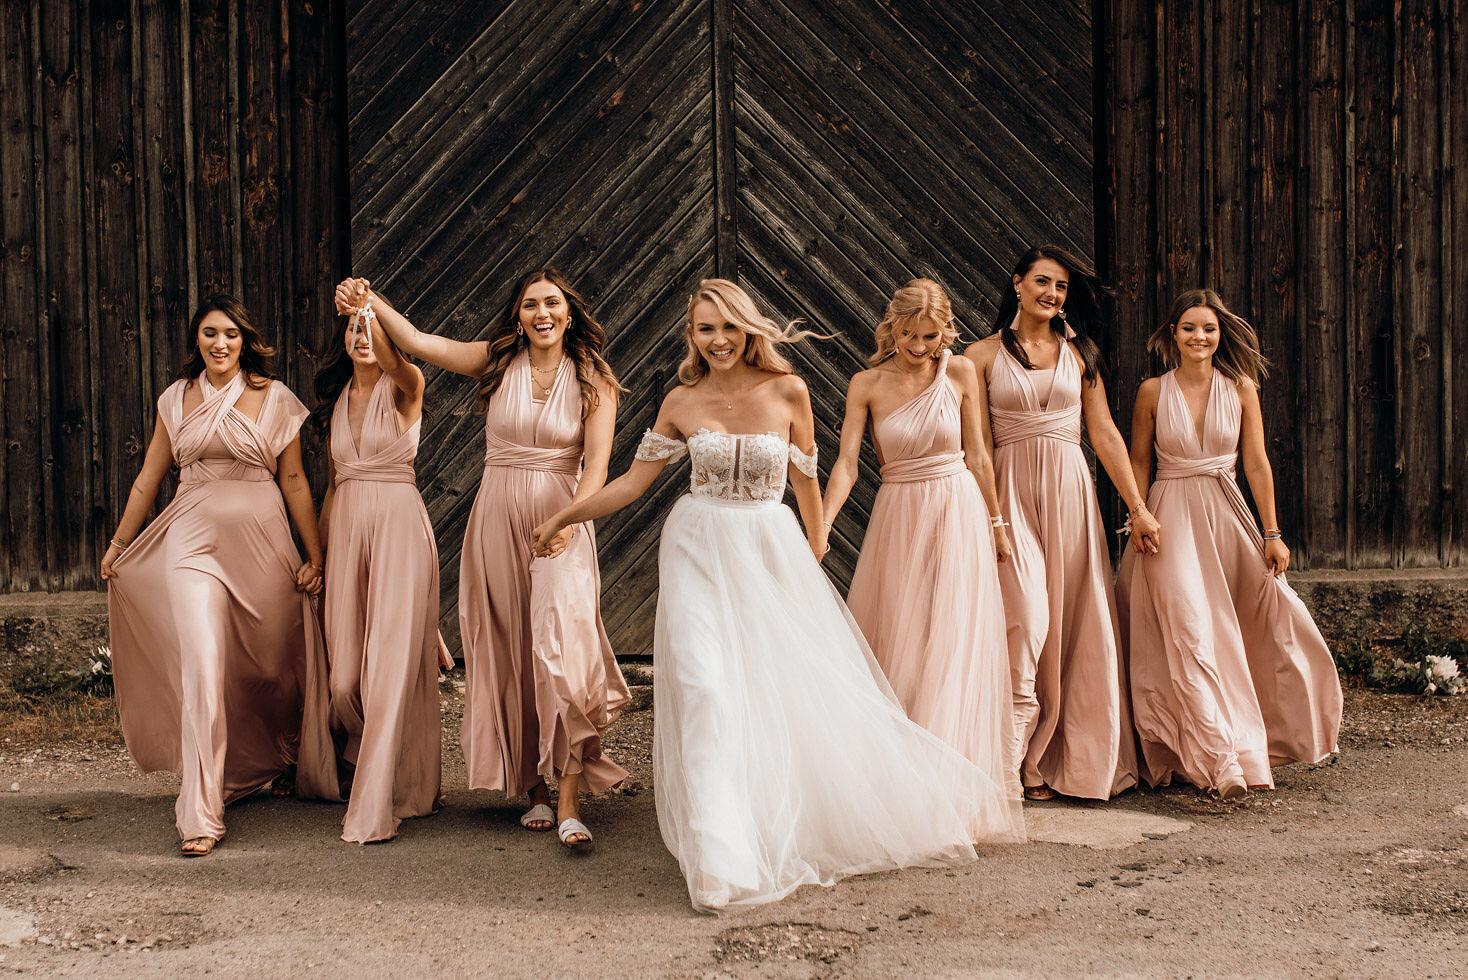 We-Are-Flowergirls-Bridesmaids-Dresses-Bride-PATRIZIA-PALME-©Beloved-Photography-10.jpg